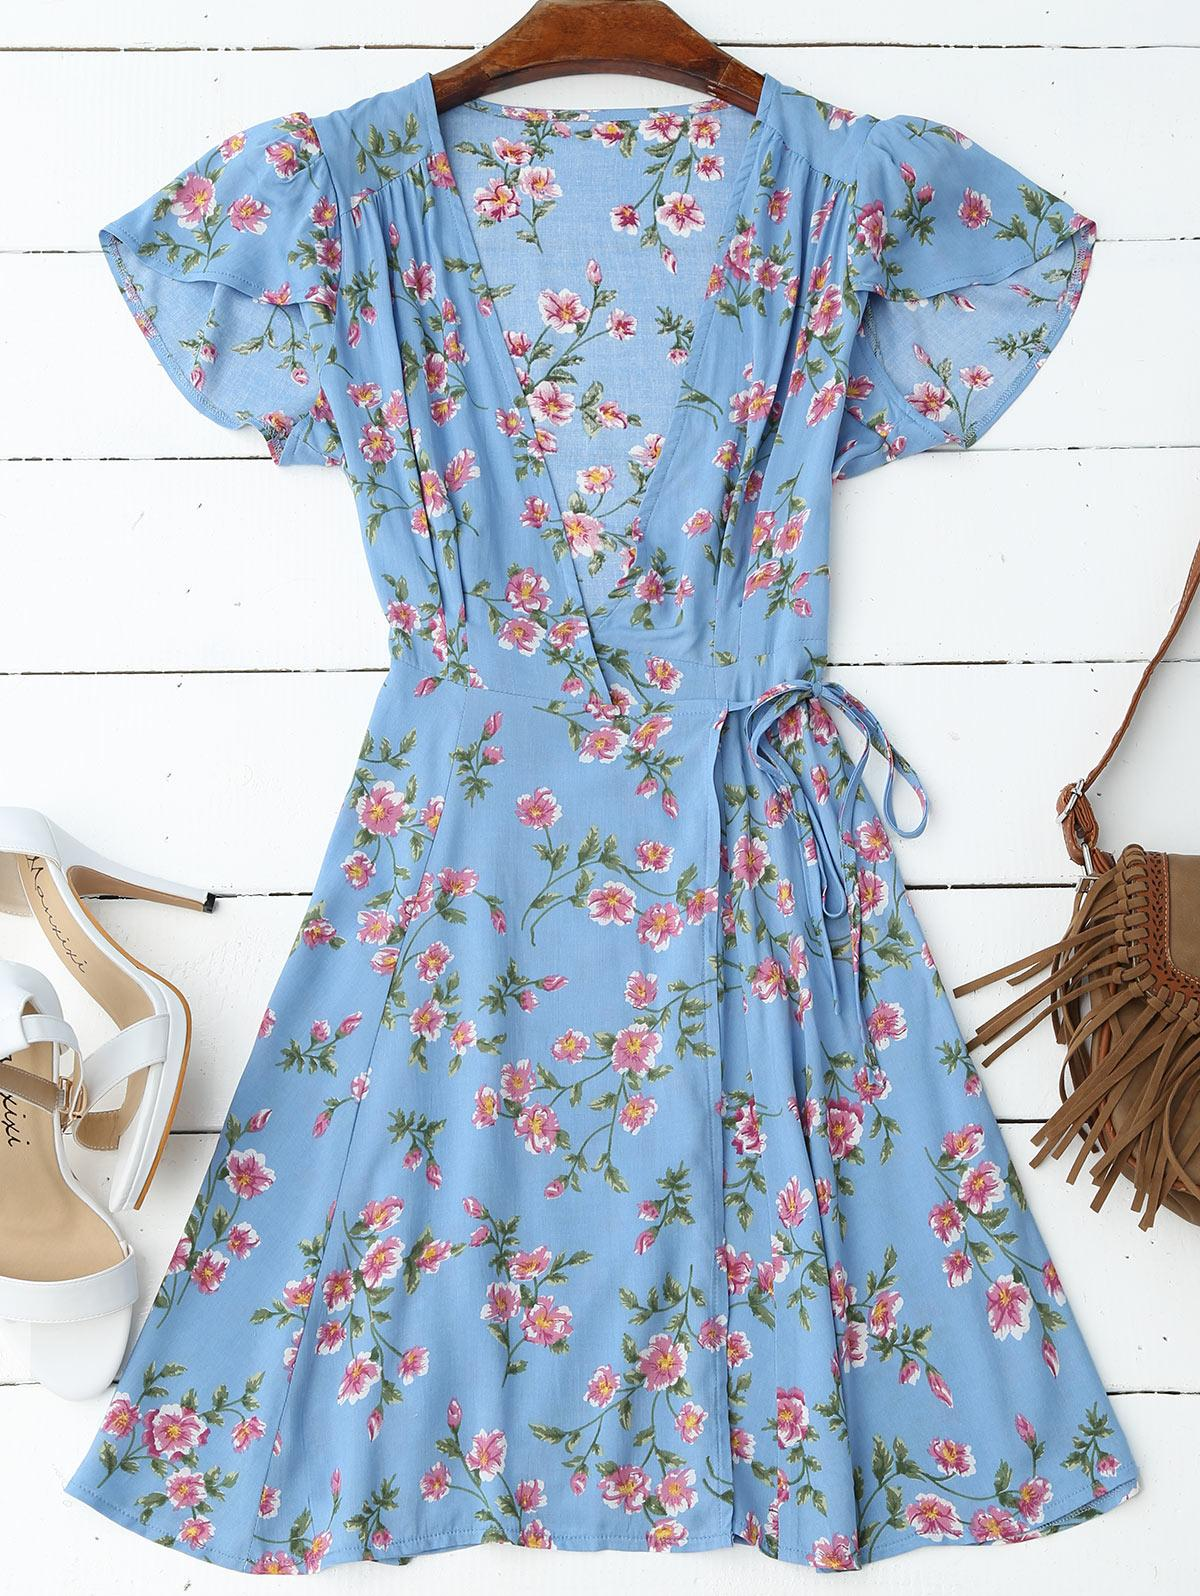 23333981fa80f 2019 ZAFUL Women Wrap Floral Mini Dress Short Sleeve Deep V Neck Flower  Print Bowknot Dresses Casual 2018 Summer Beach Dress Vestidos From  Qingxin13